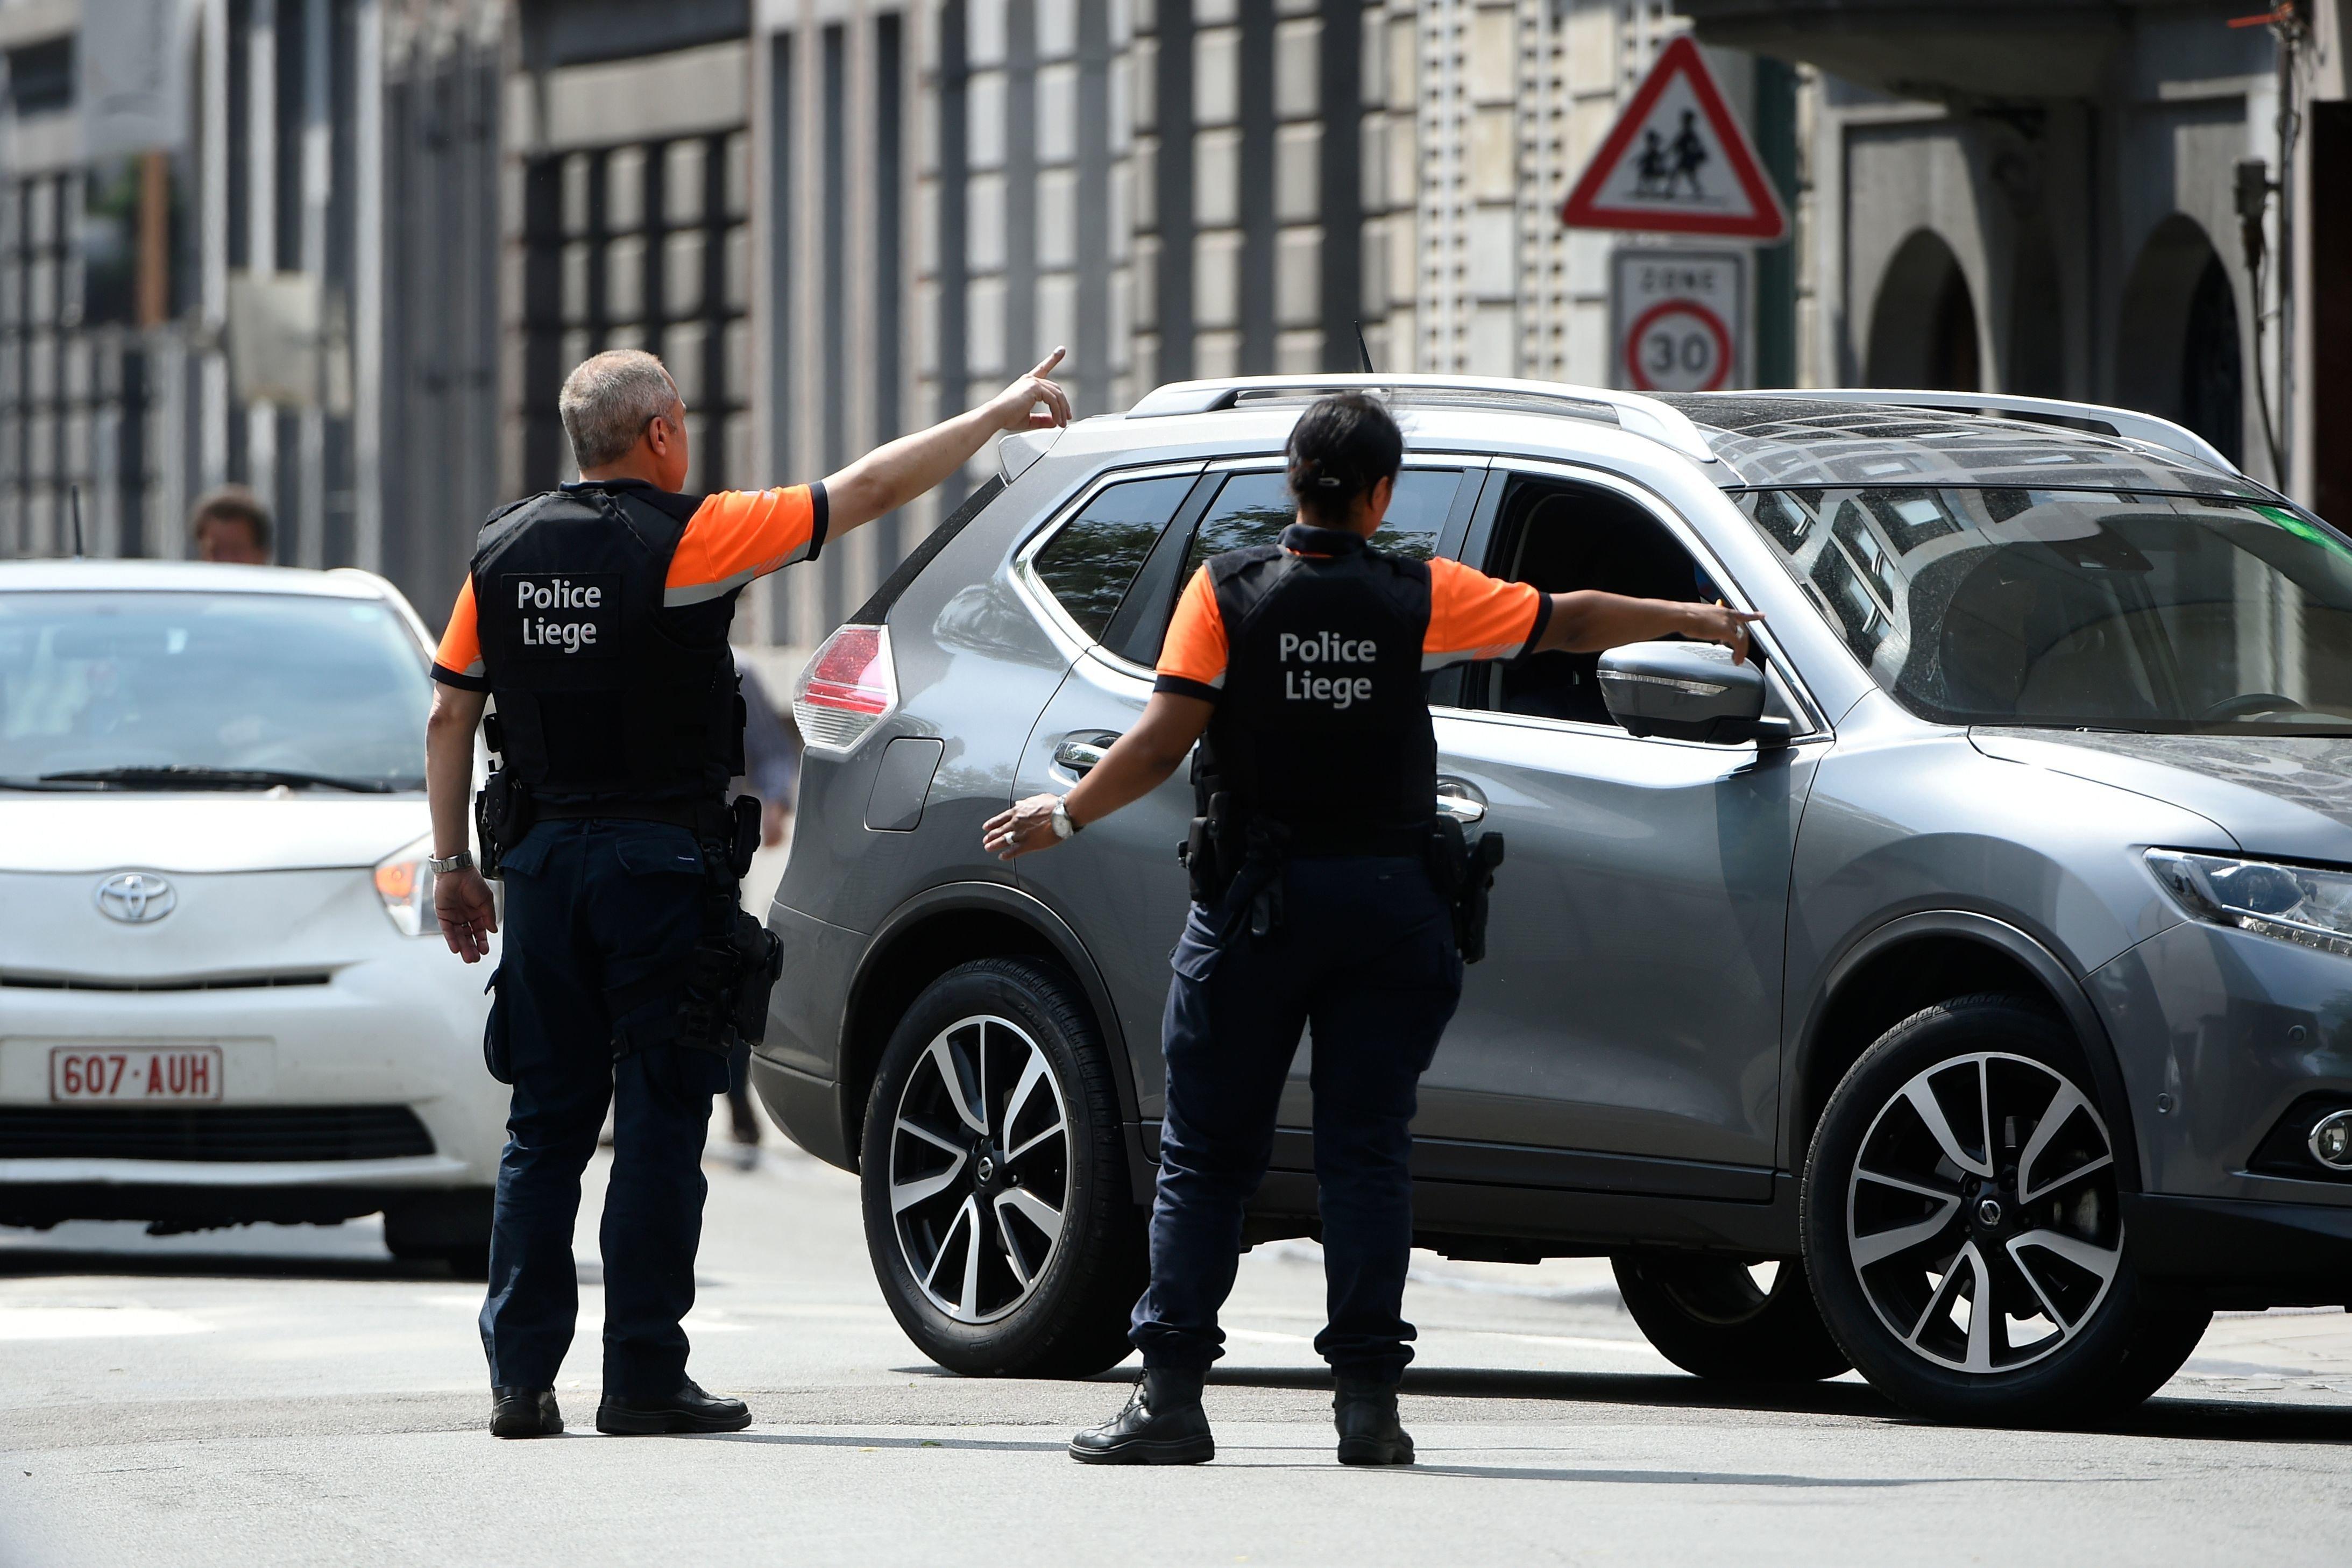 Belgium Police Killings Being Treated As 'Terrorist